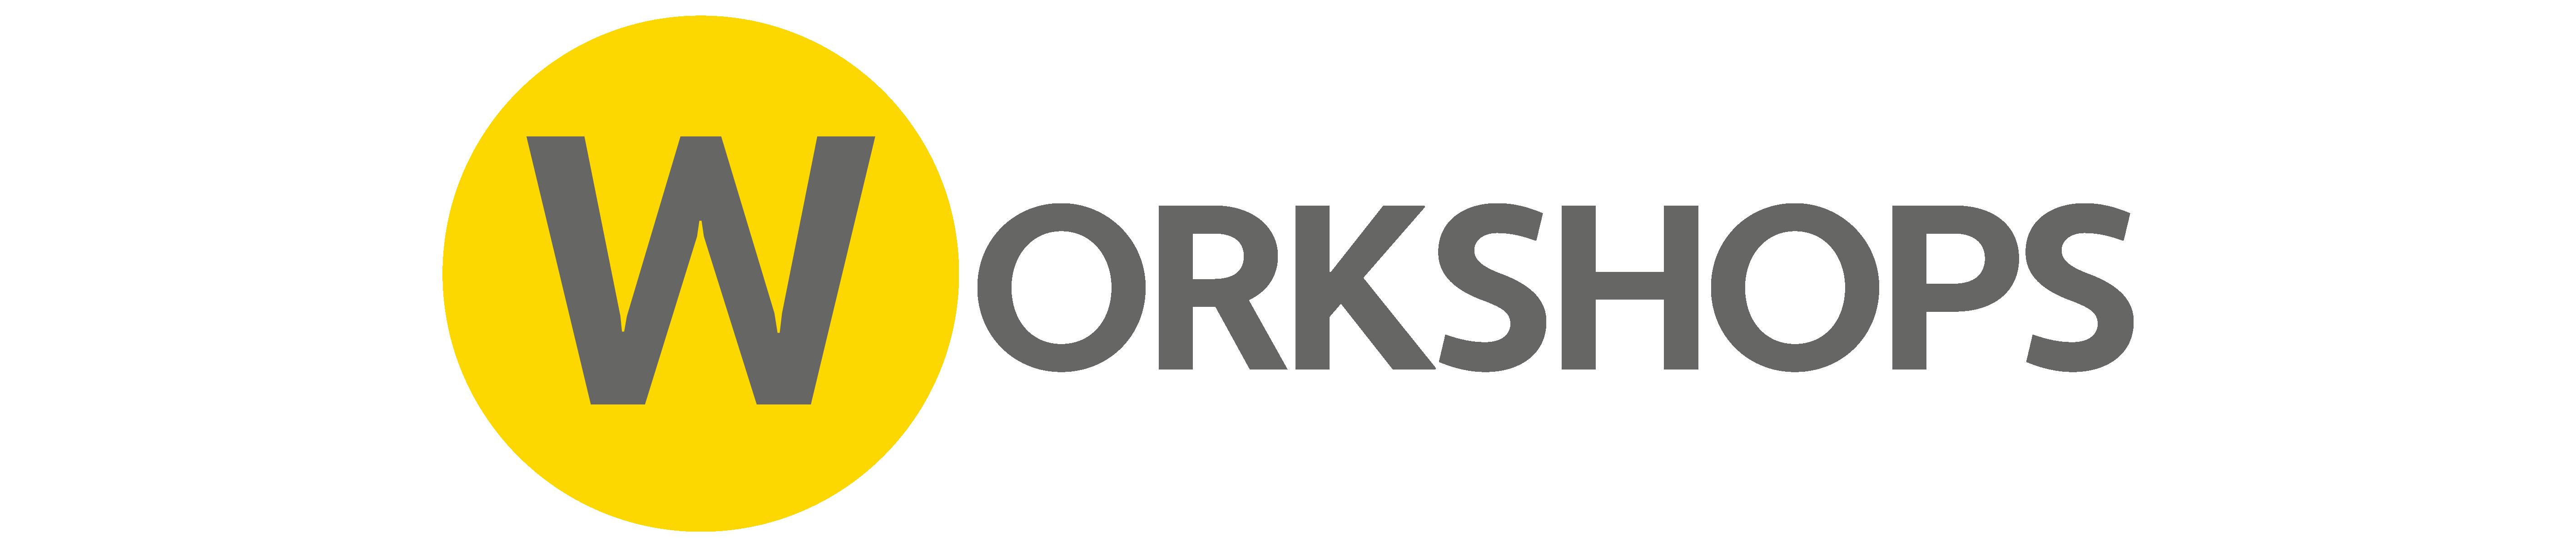 iSTORYa Studio Workshops Services